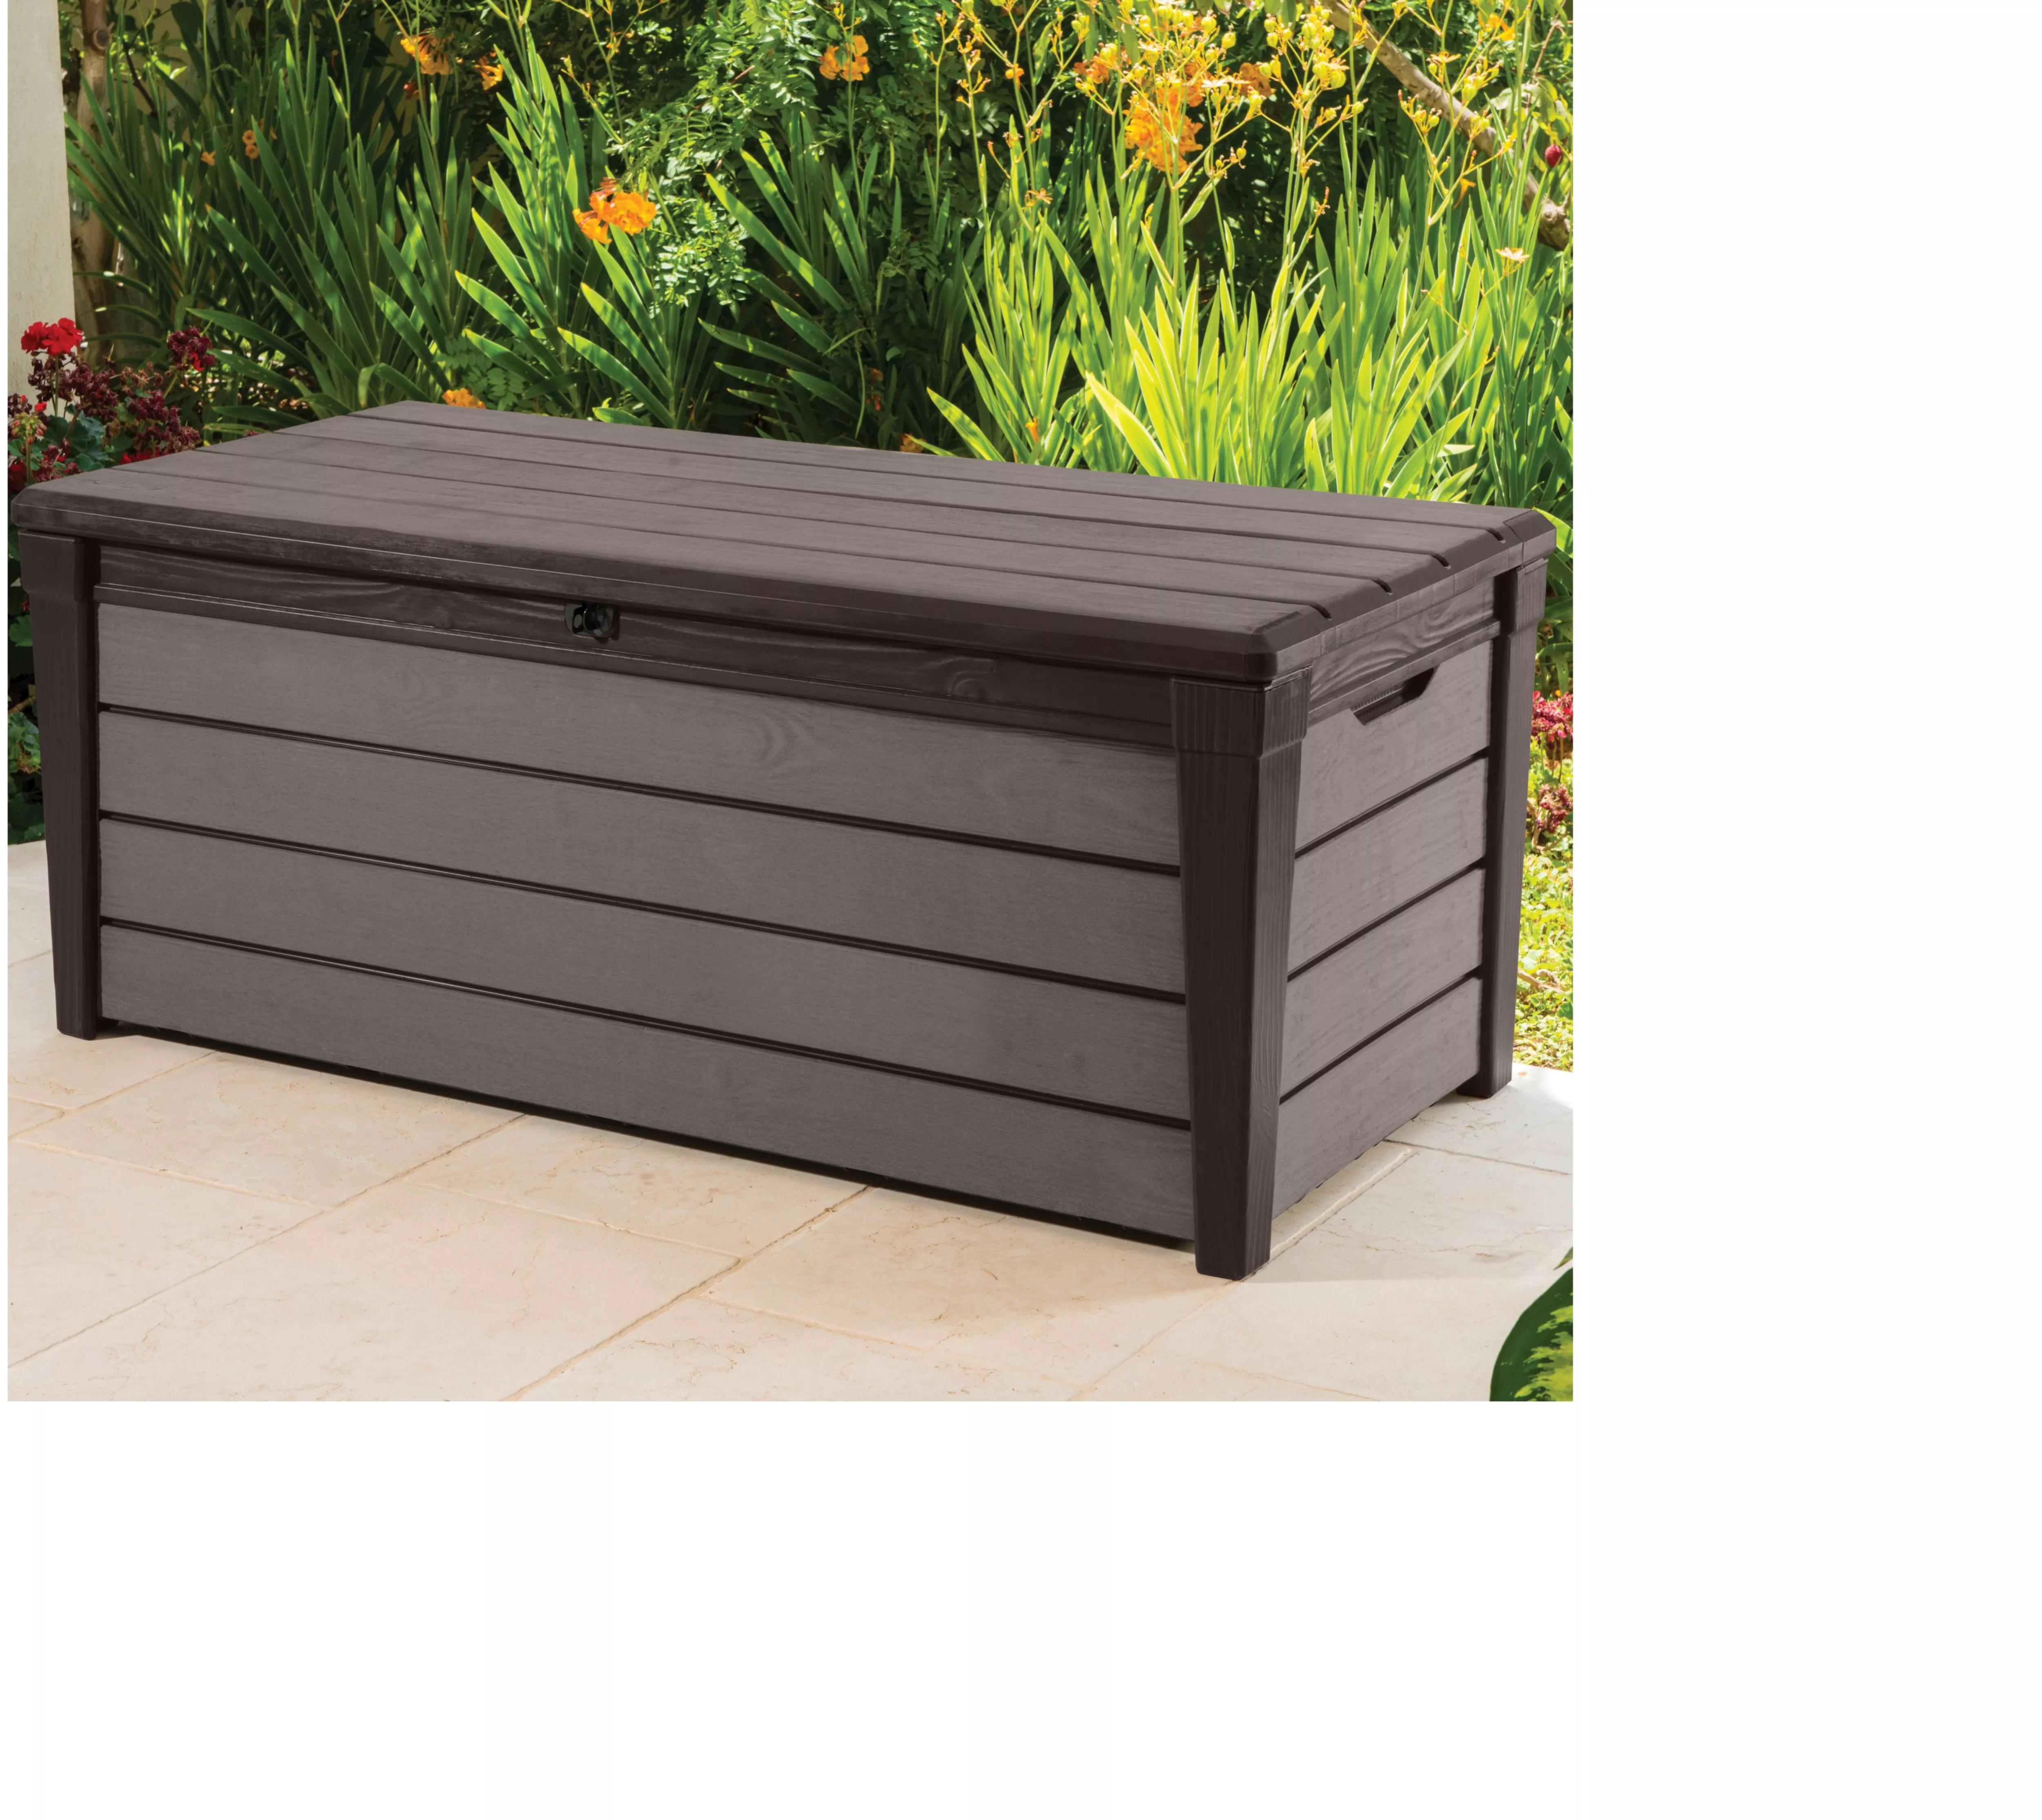 Brushwood Plastic Wood Effect Plastic Garden Storage Box